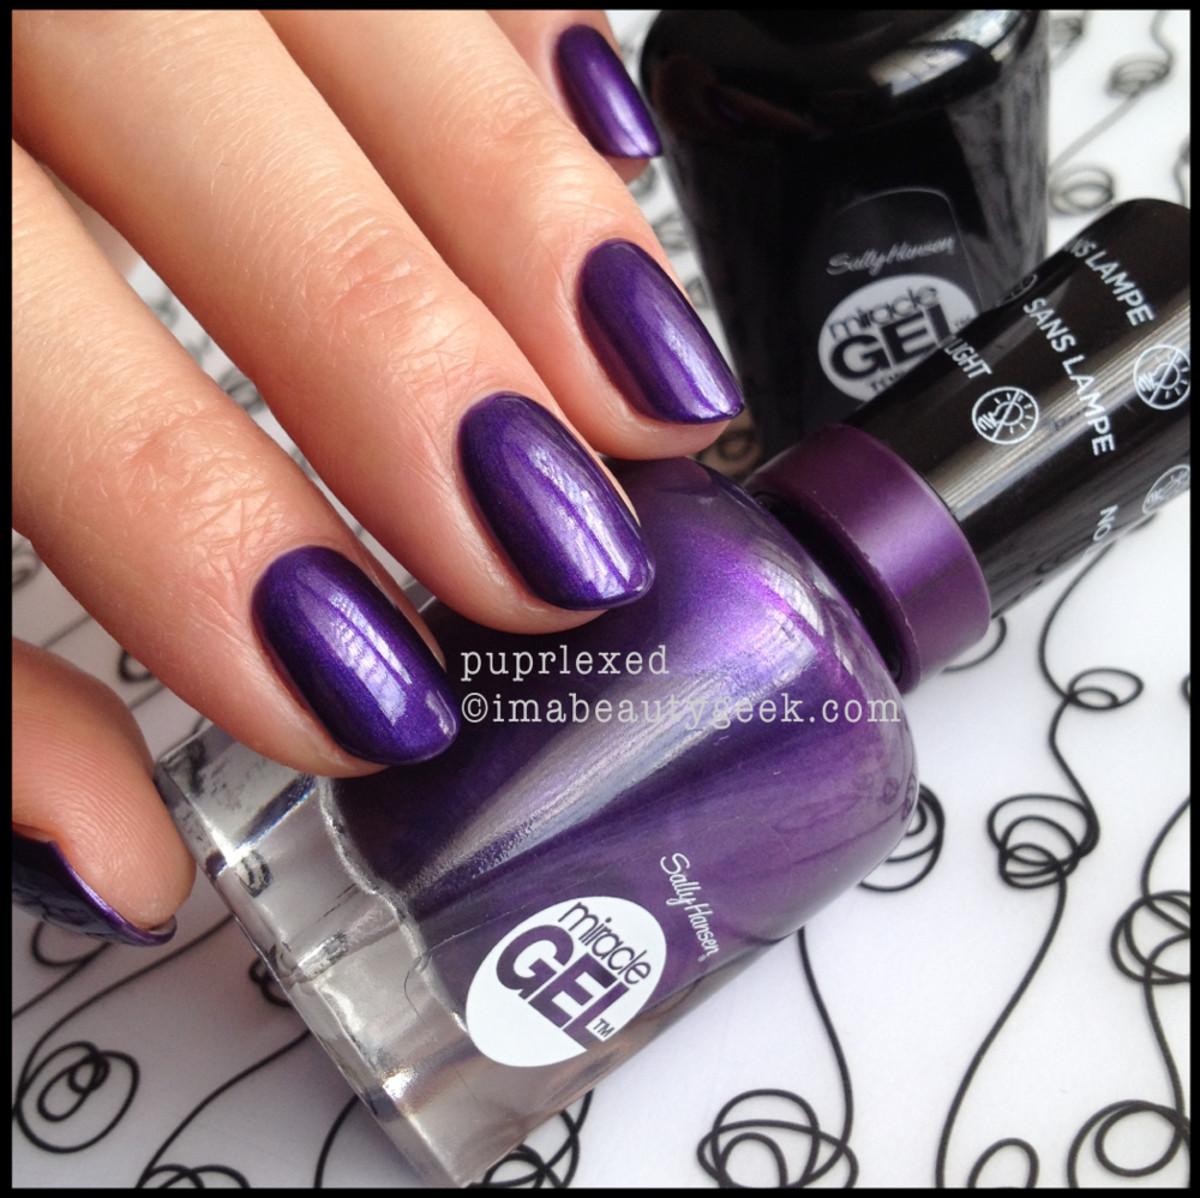 Sally Hansen Miracle Gel Purplexed 2014